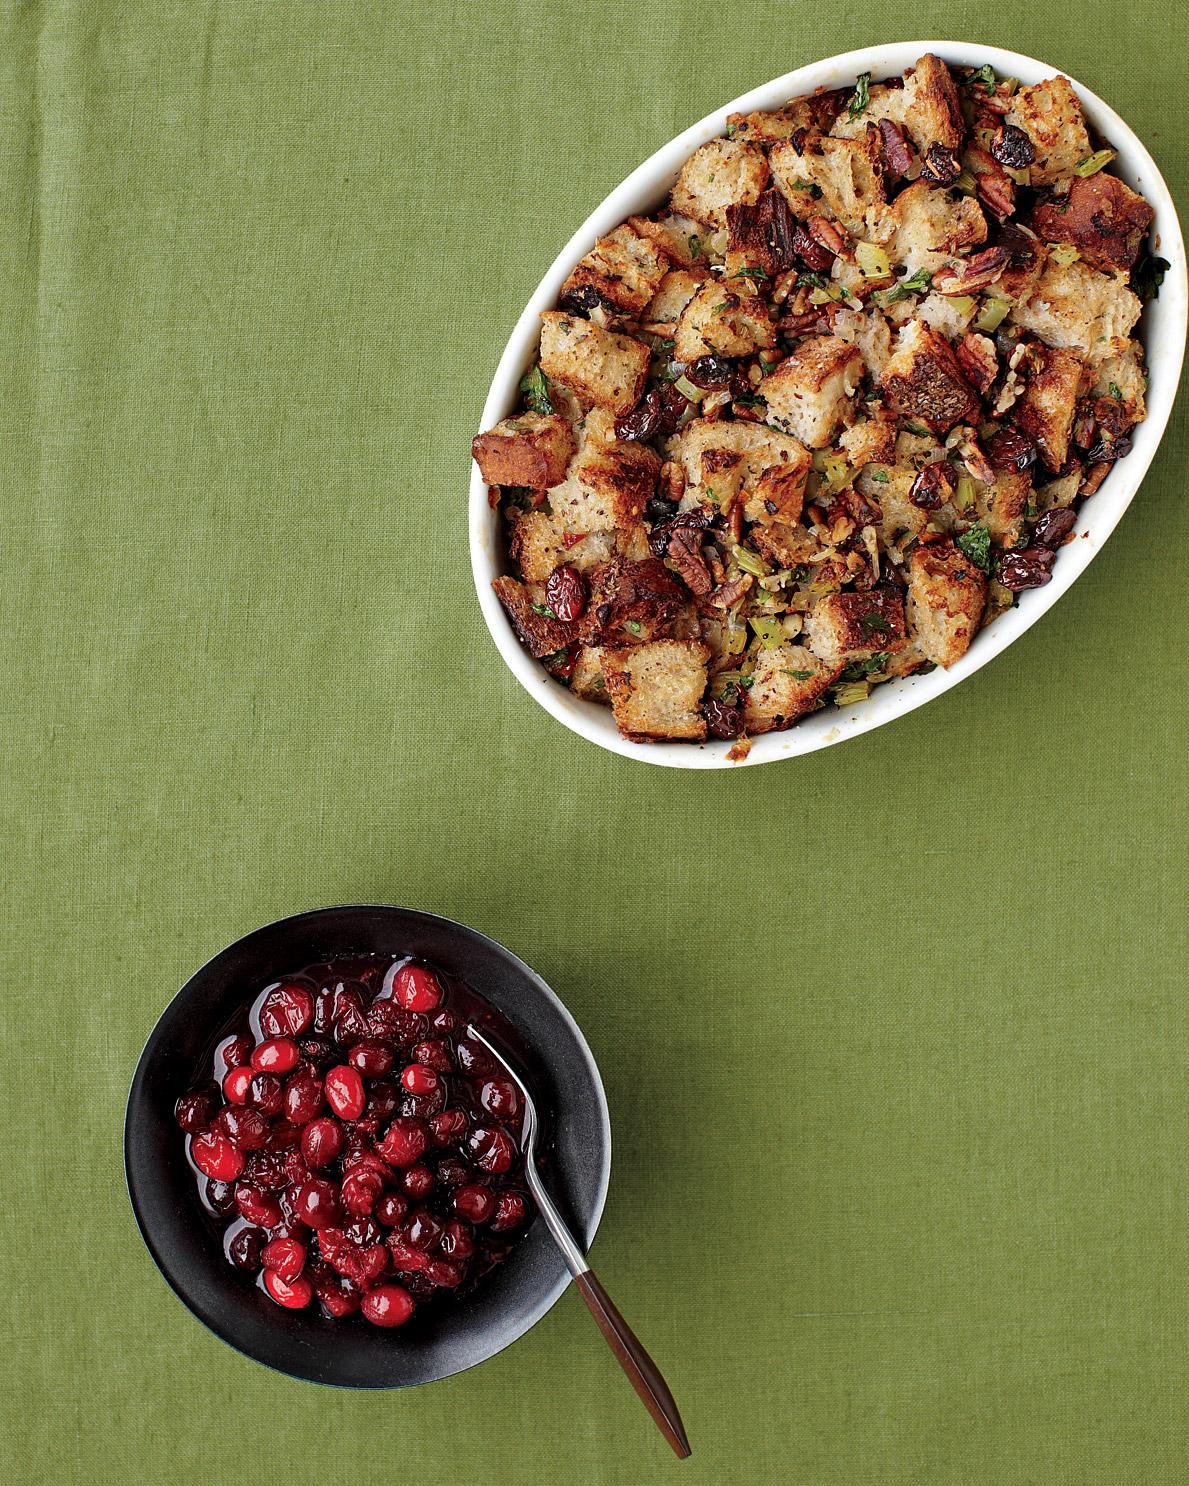 thanksgiving-stuffing-cranberry-sauce-med107616.jpg